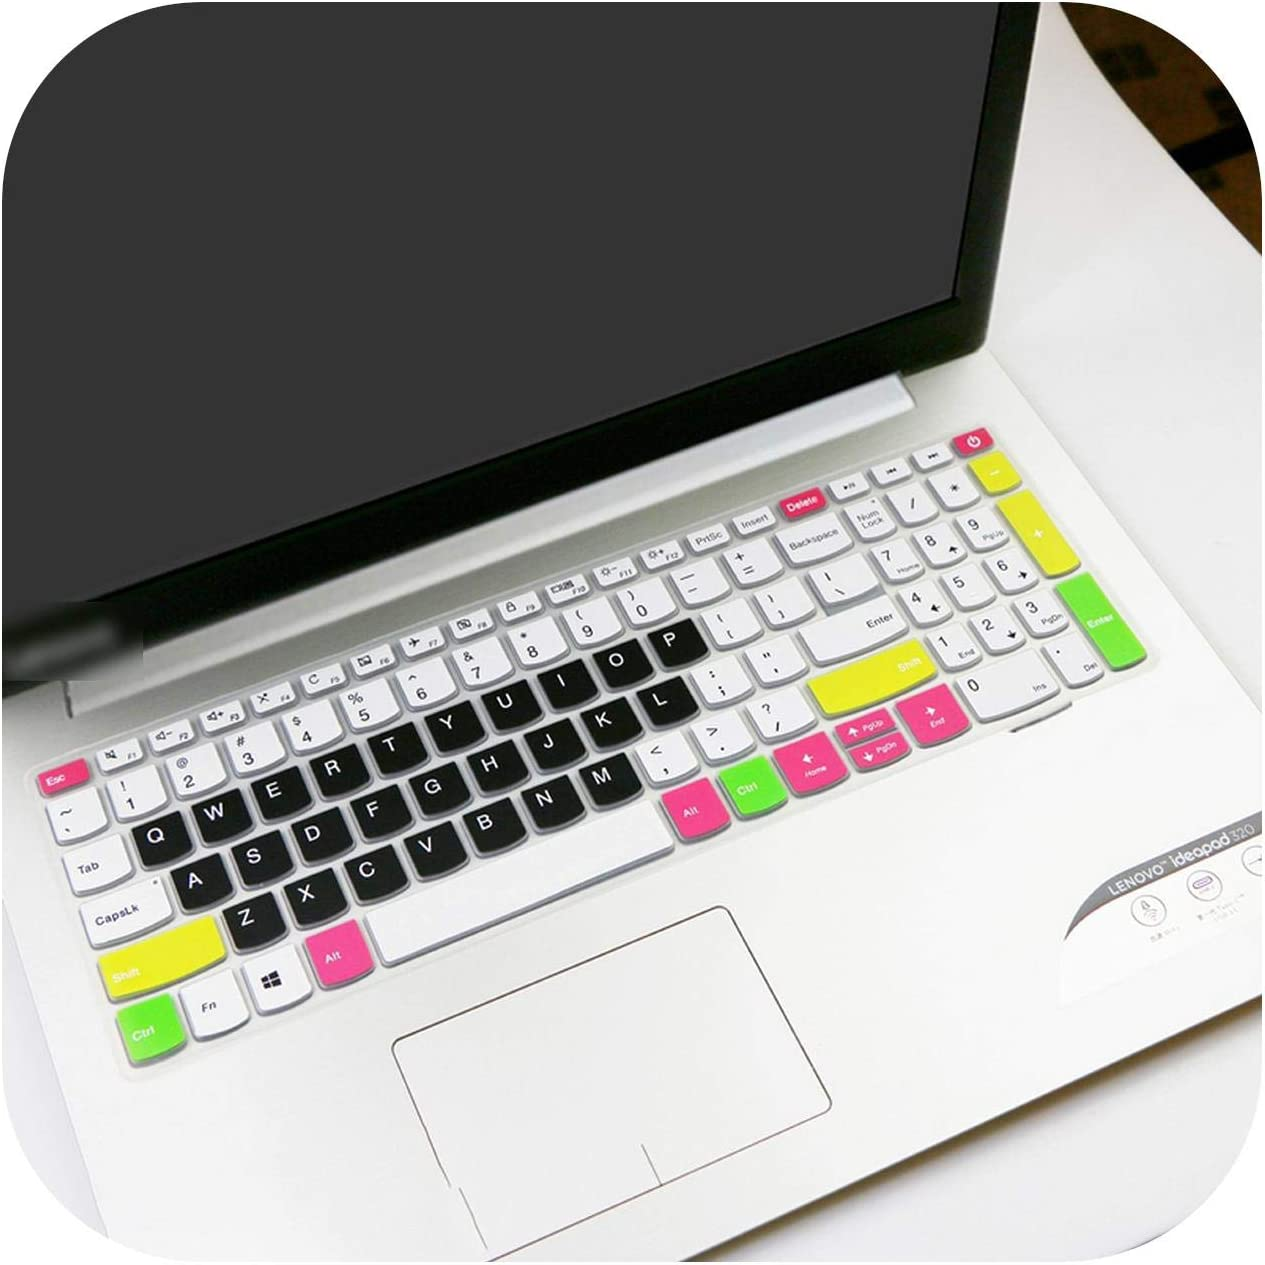 Laptop Keyboard Cover Skin Protector for Lenovo ideapad 320 330 17 330-17 330-17ikb 320-17IKBR V320-17IKB 330-17IKBR 17.3 inch-candyblack-